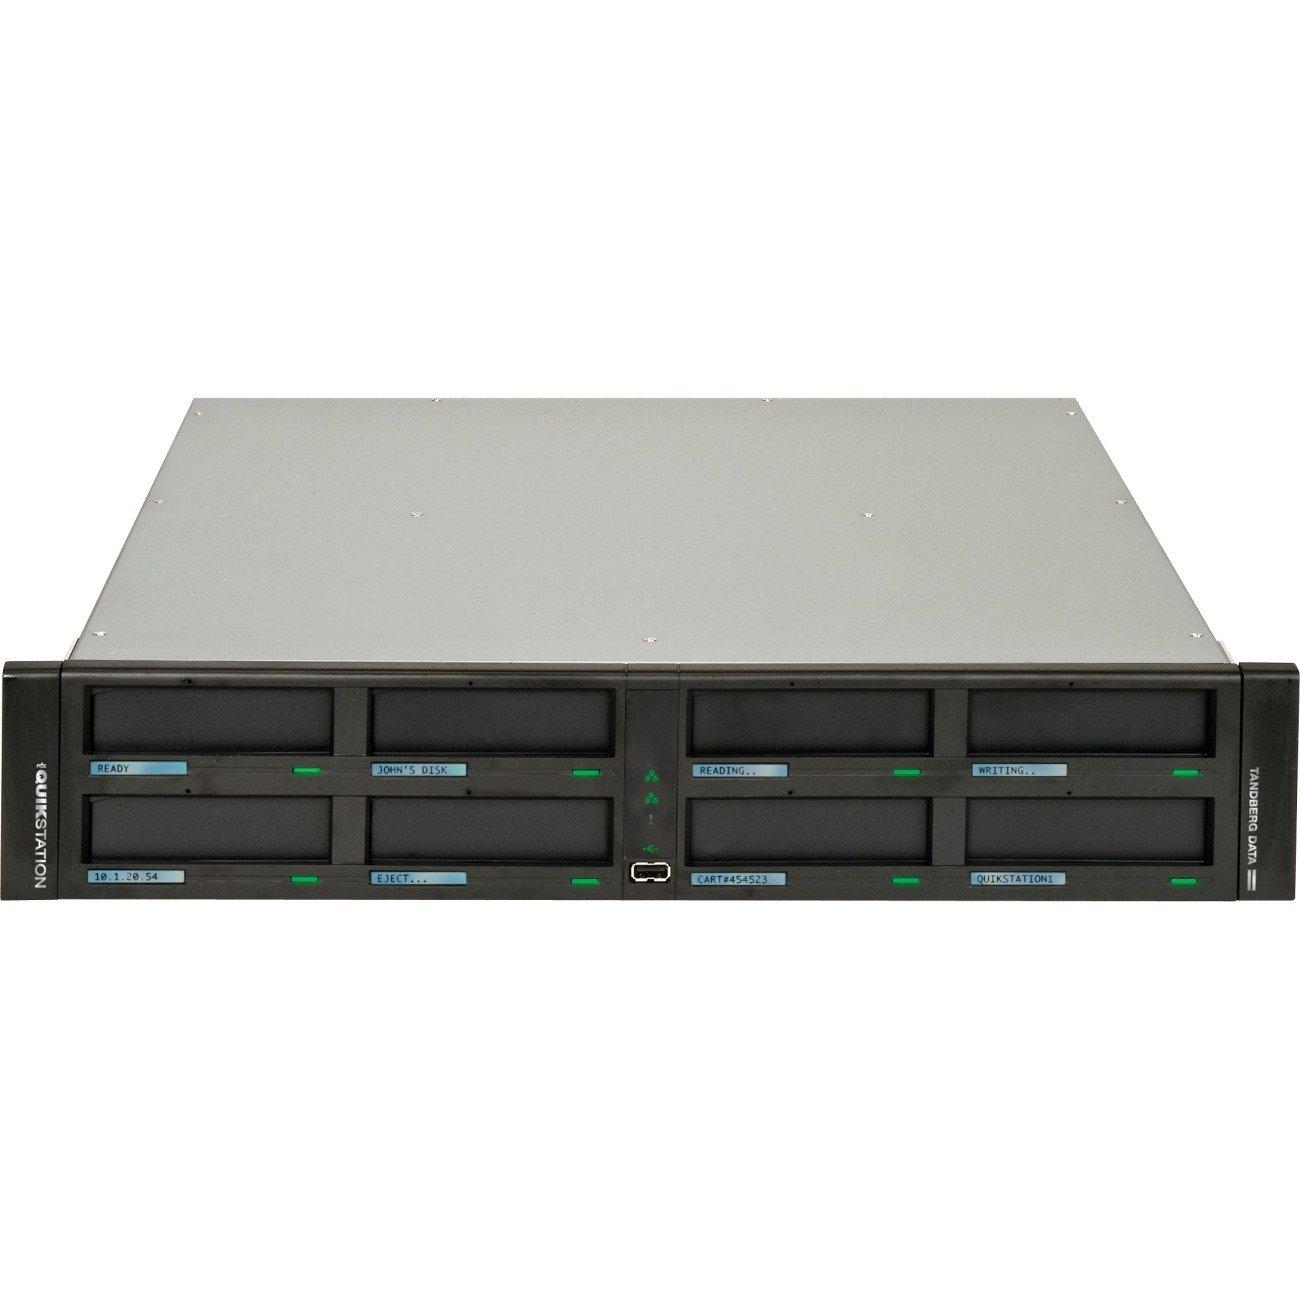 Tandberg Data QuikStation 8900-RDX 8 x Total Bays NAS Storage System - 2U Rack-mountable